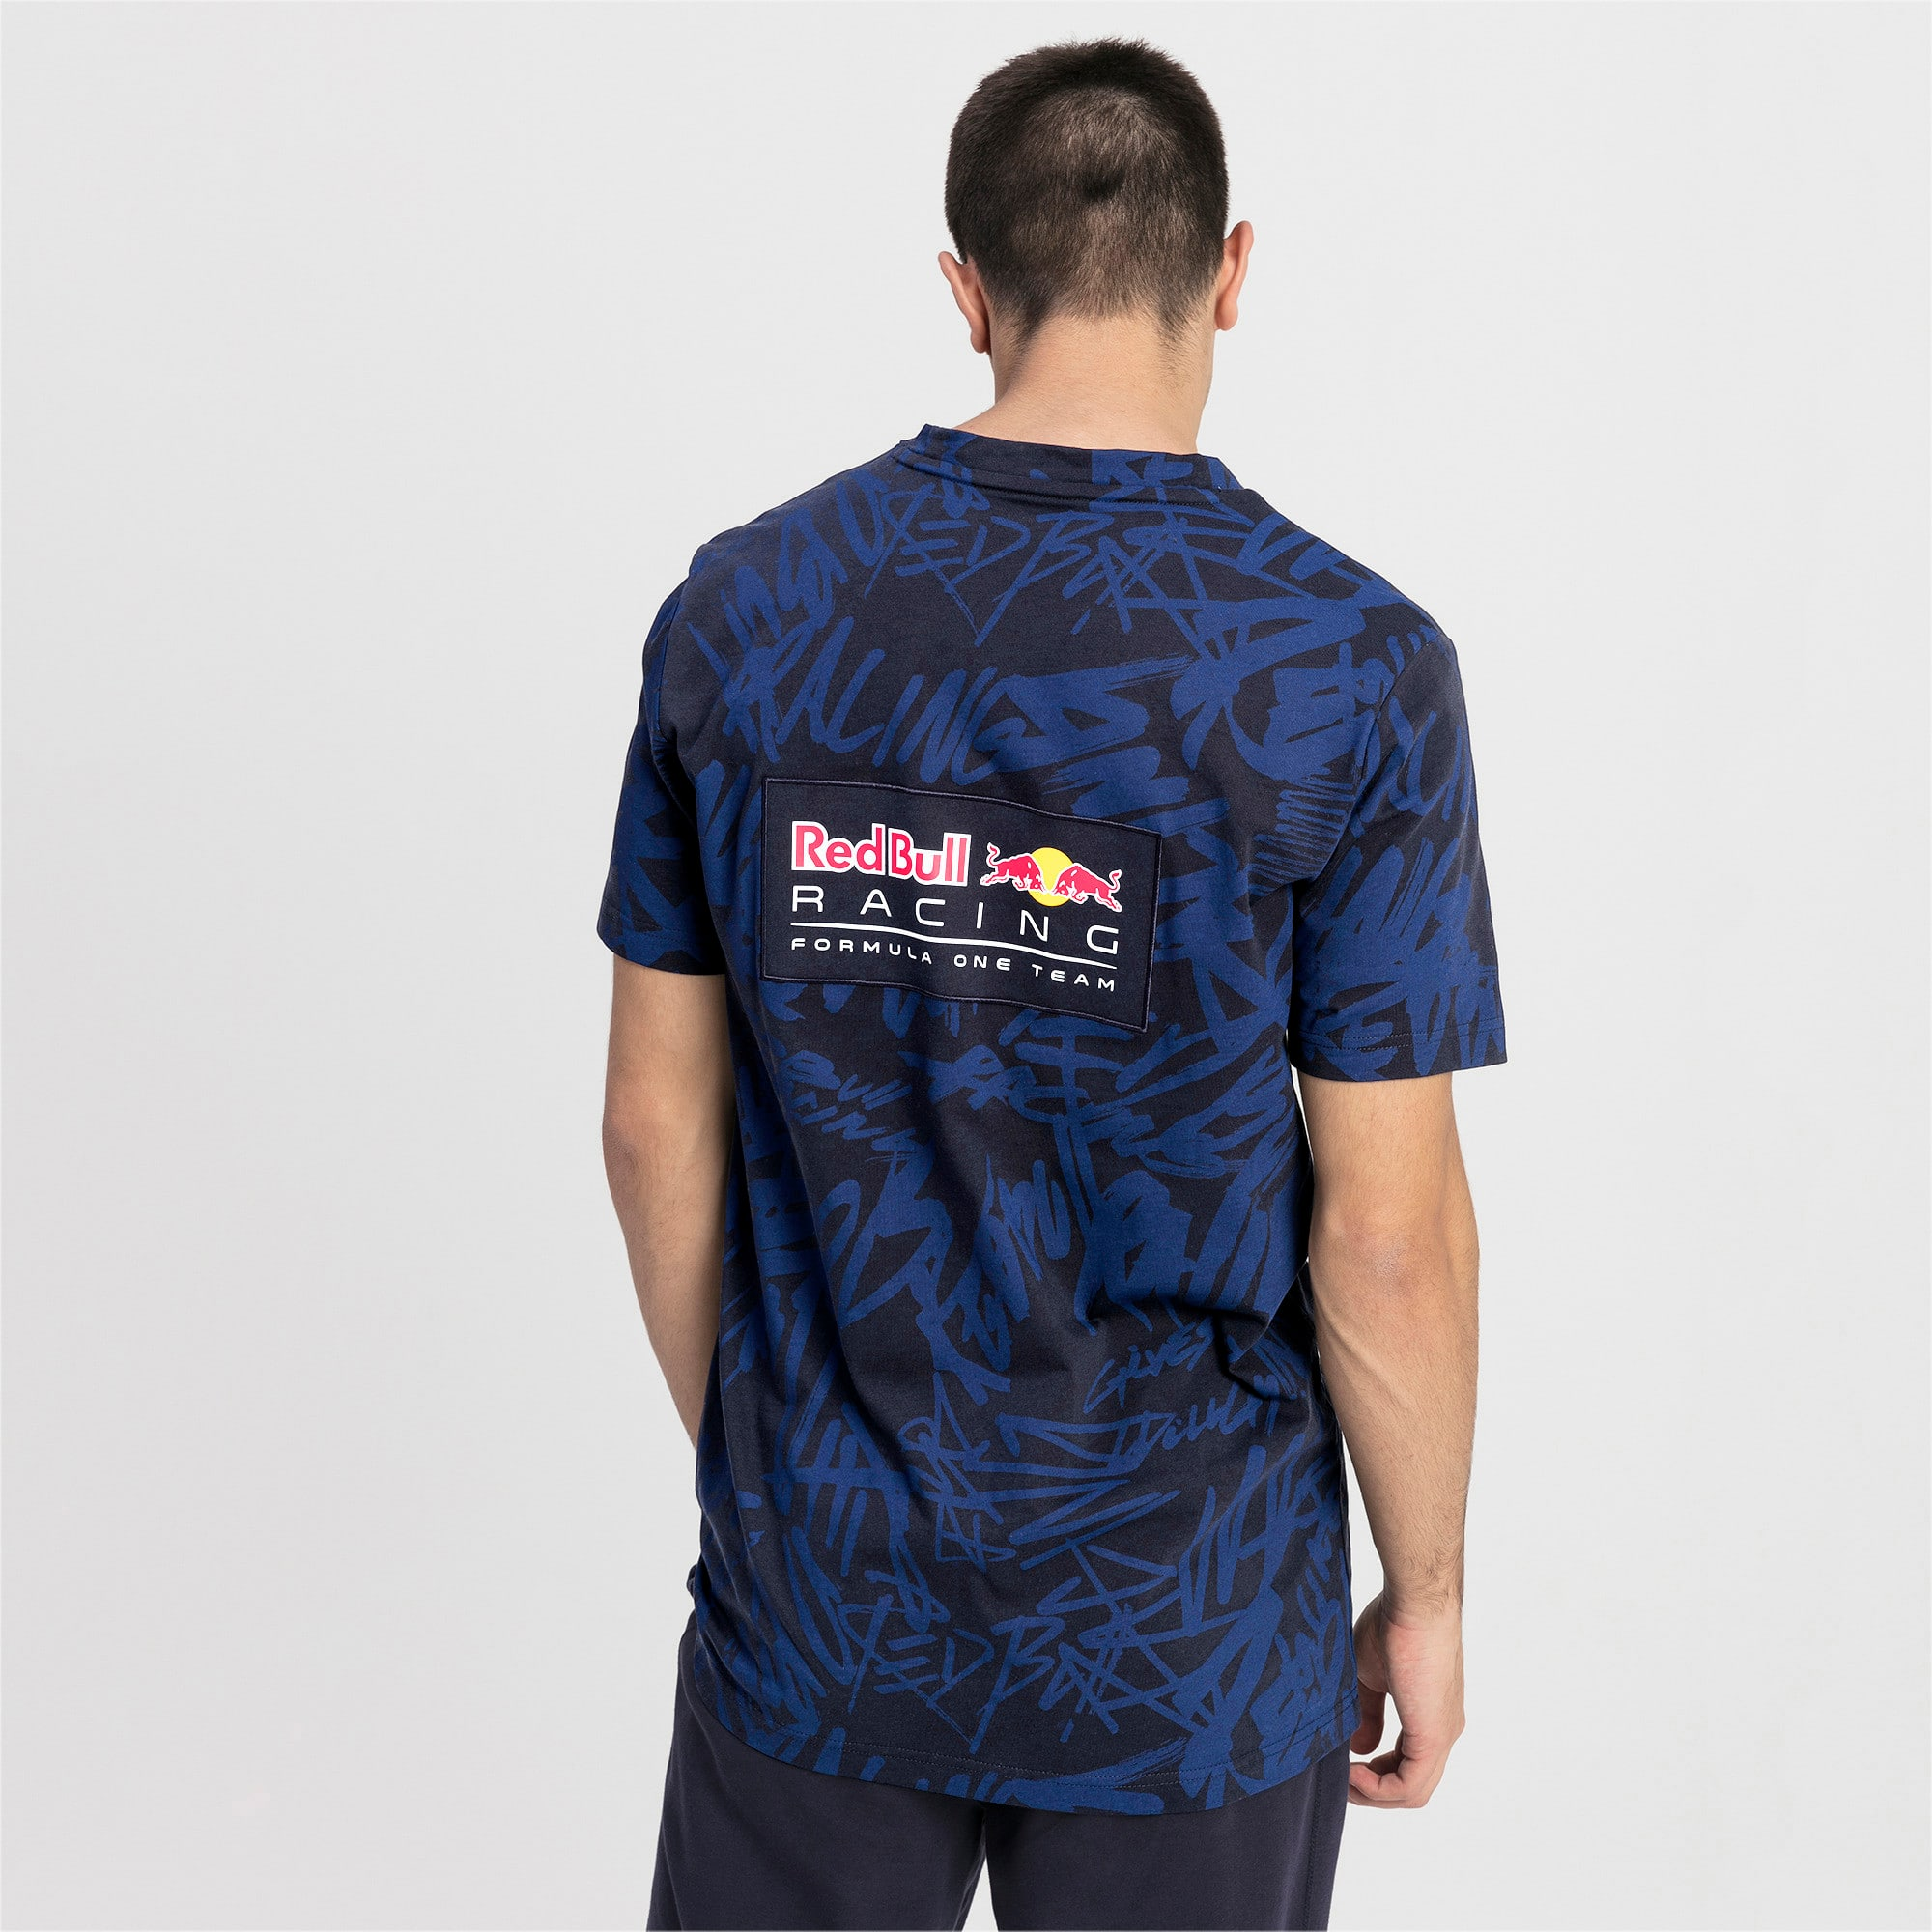 Thumbnail 2 of Red Bull Racing T-shirt voor heren, NIGHT SKY, medium